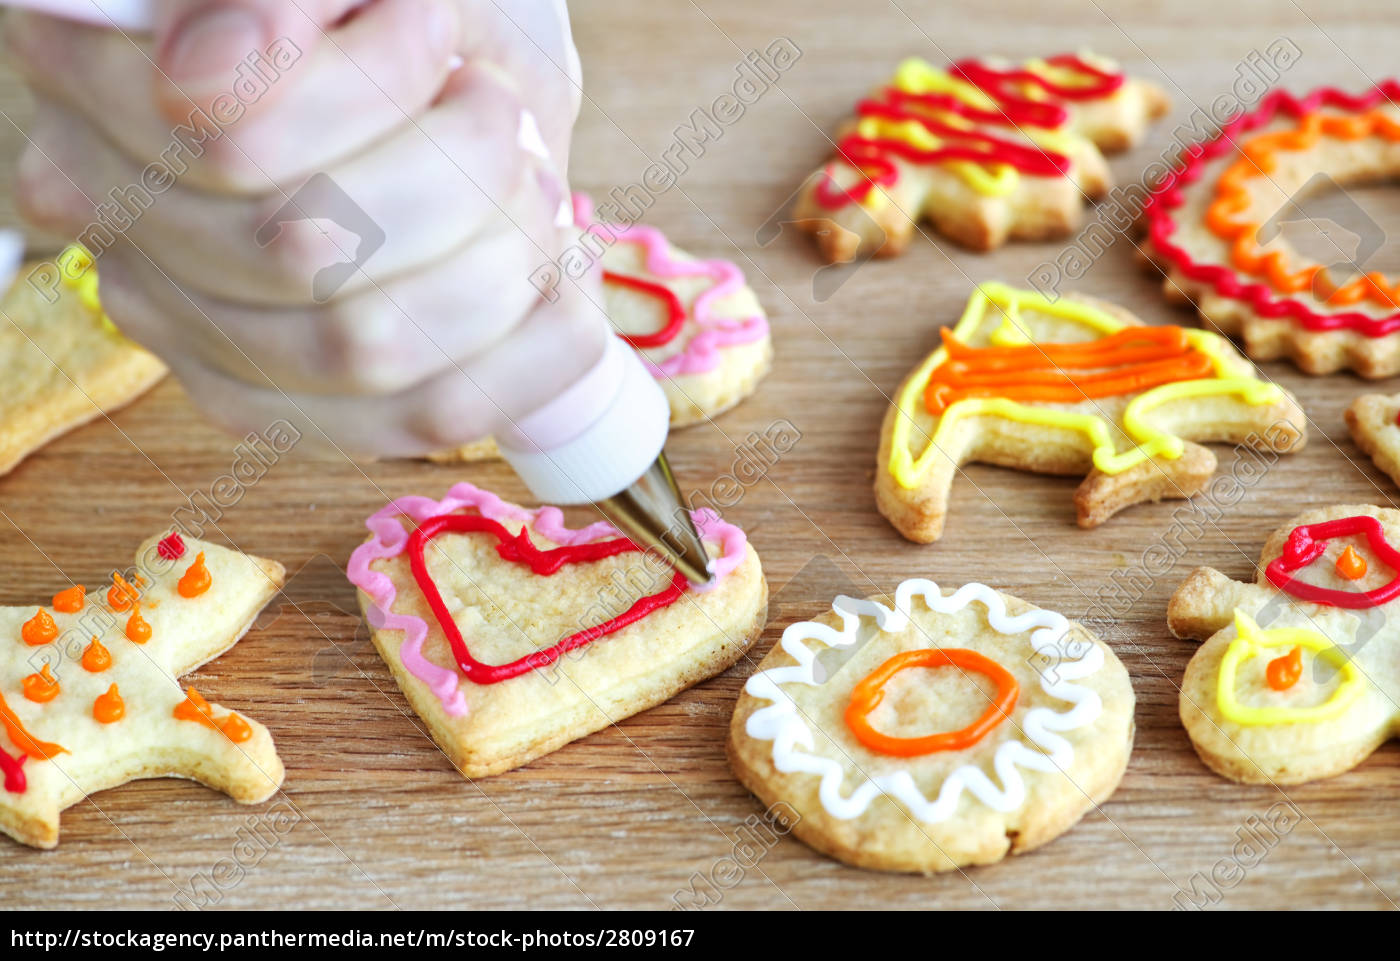 decorating, cookies - 2809167